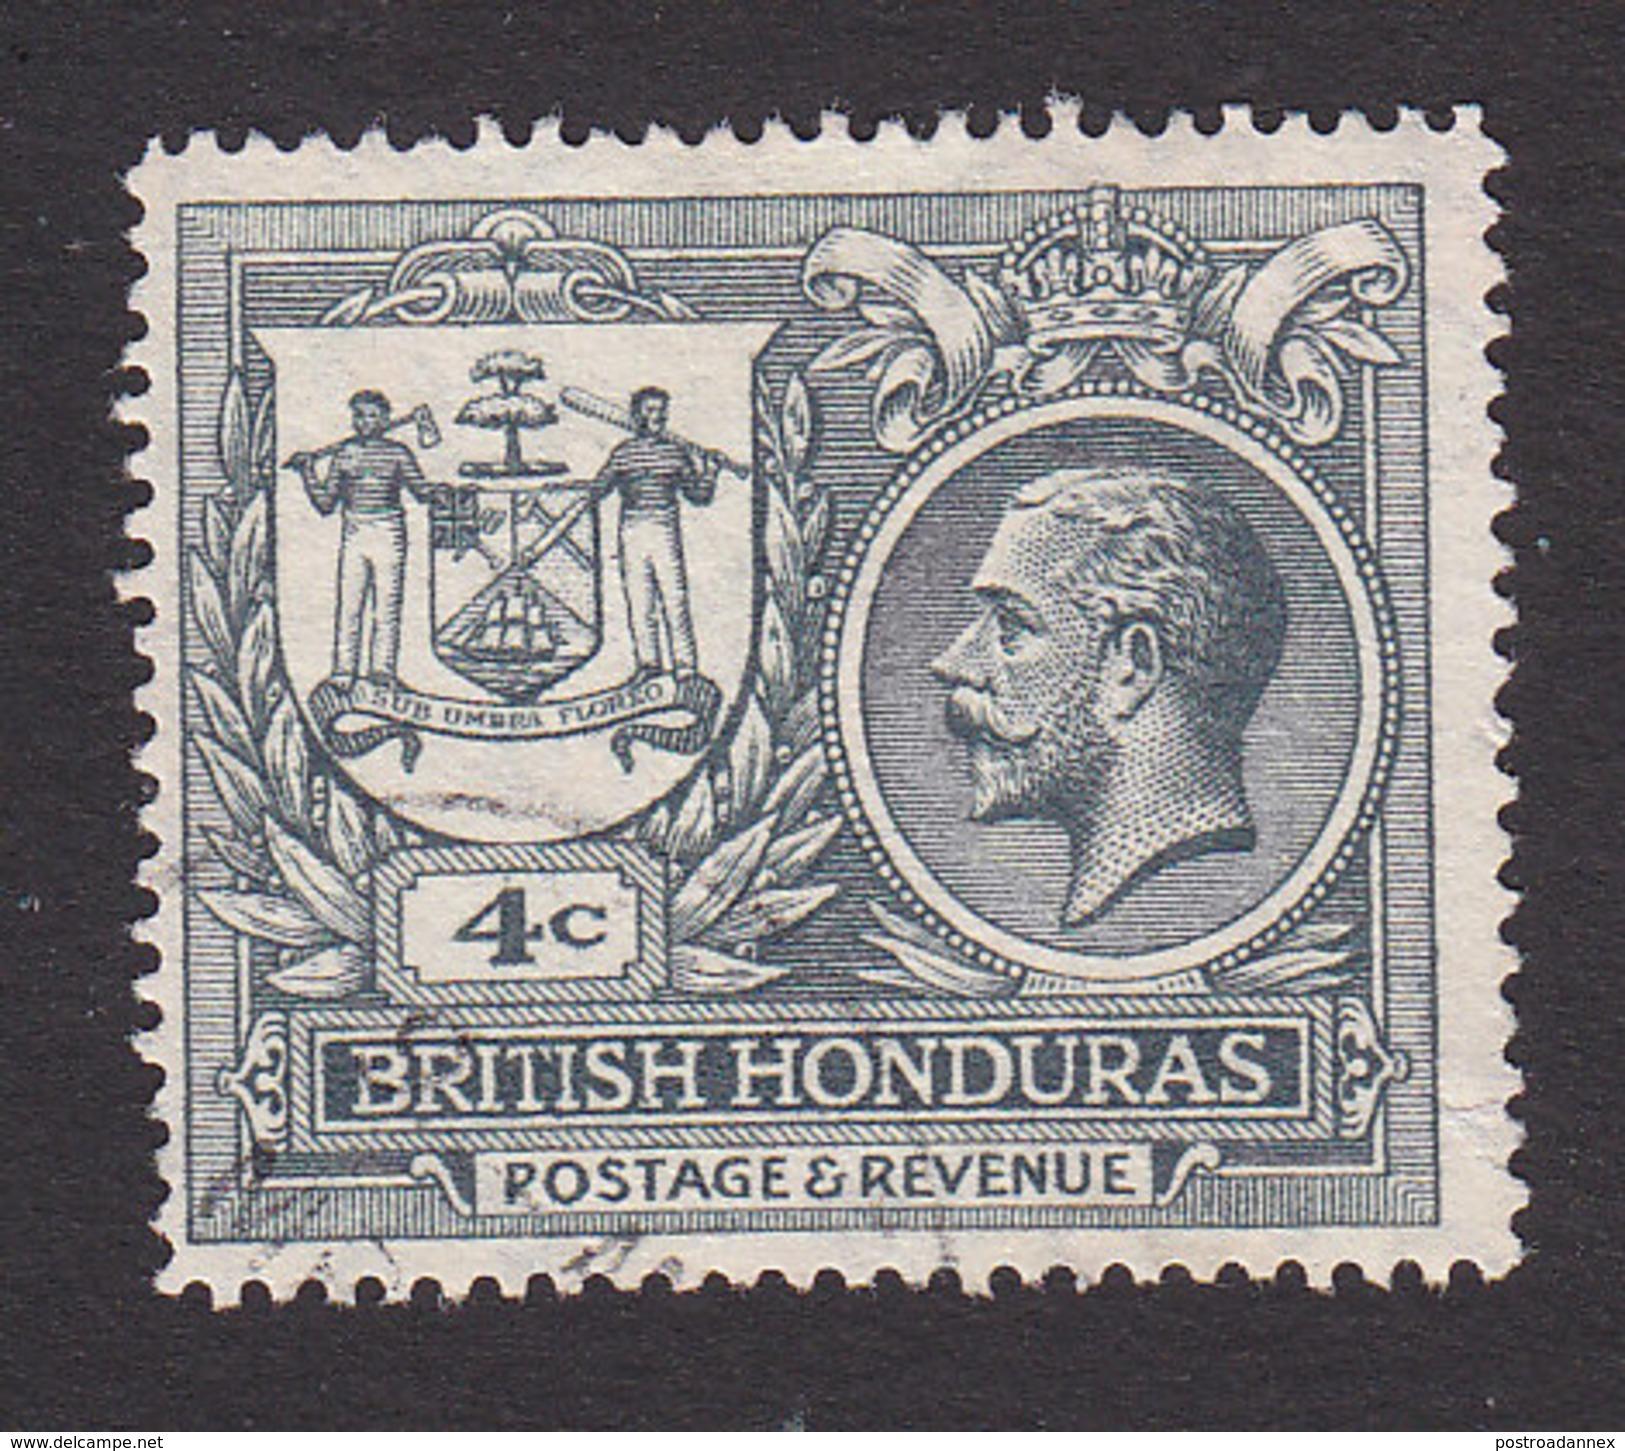 British Honduras, Scott #90, Used, Seal Of The Colony And George V, Issued 1922 - British Honduras (...-1970)